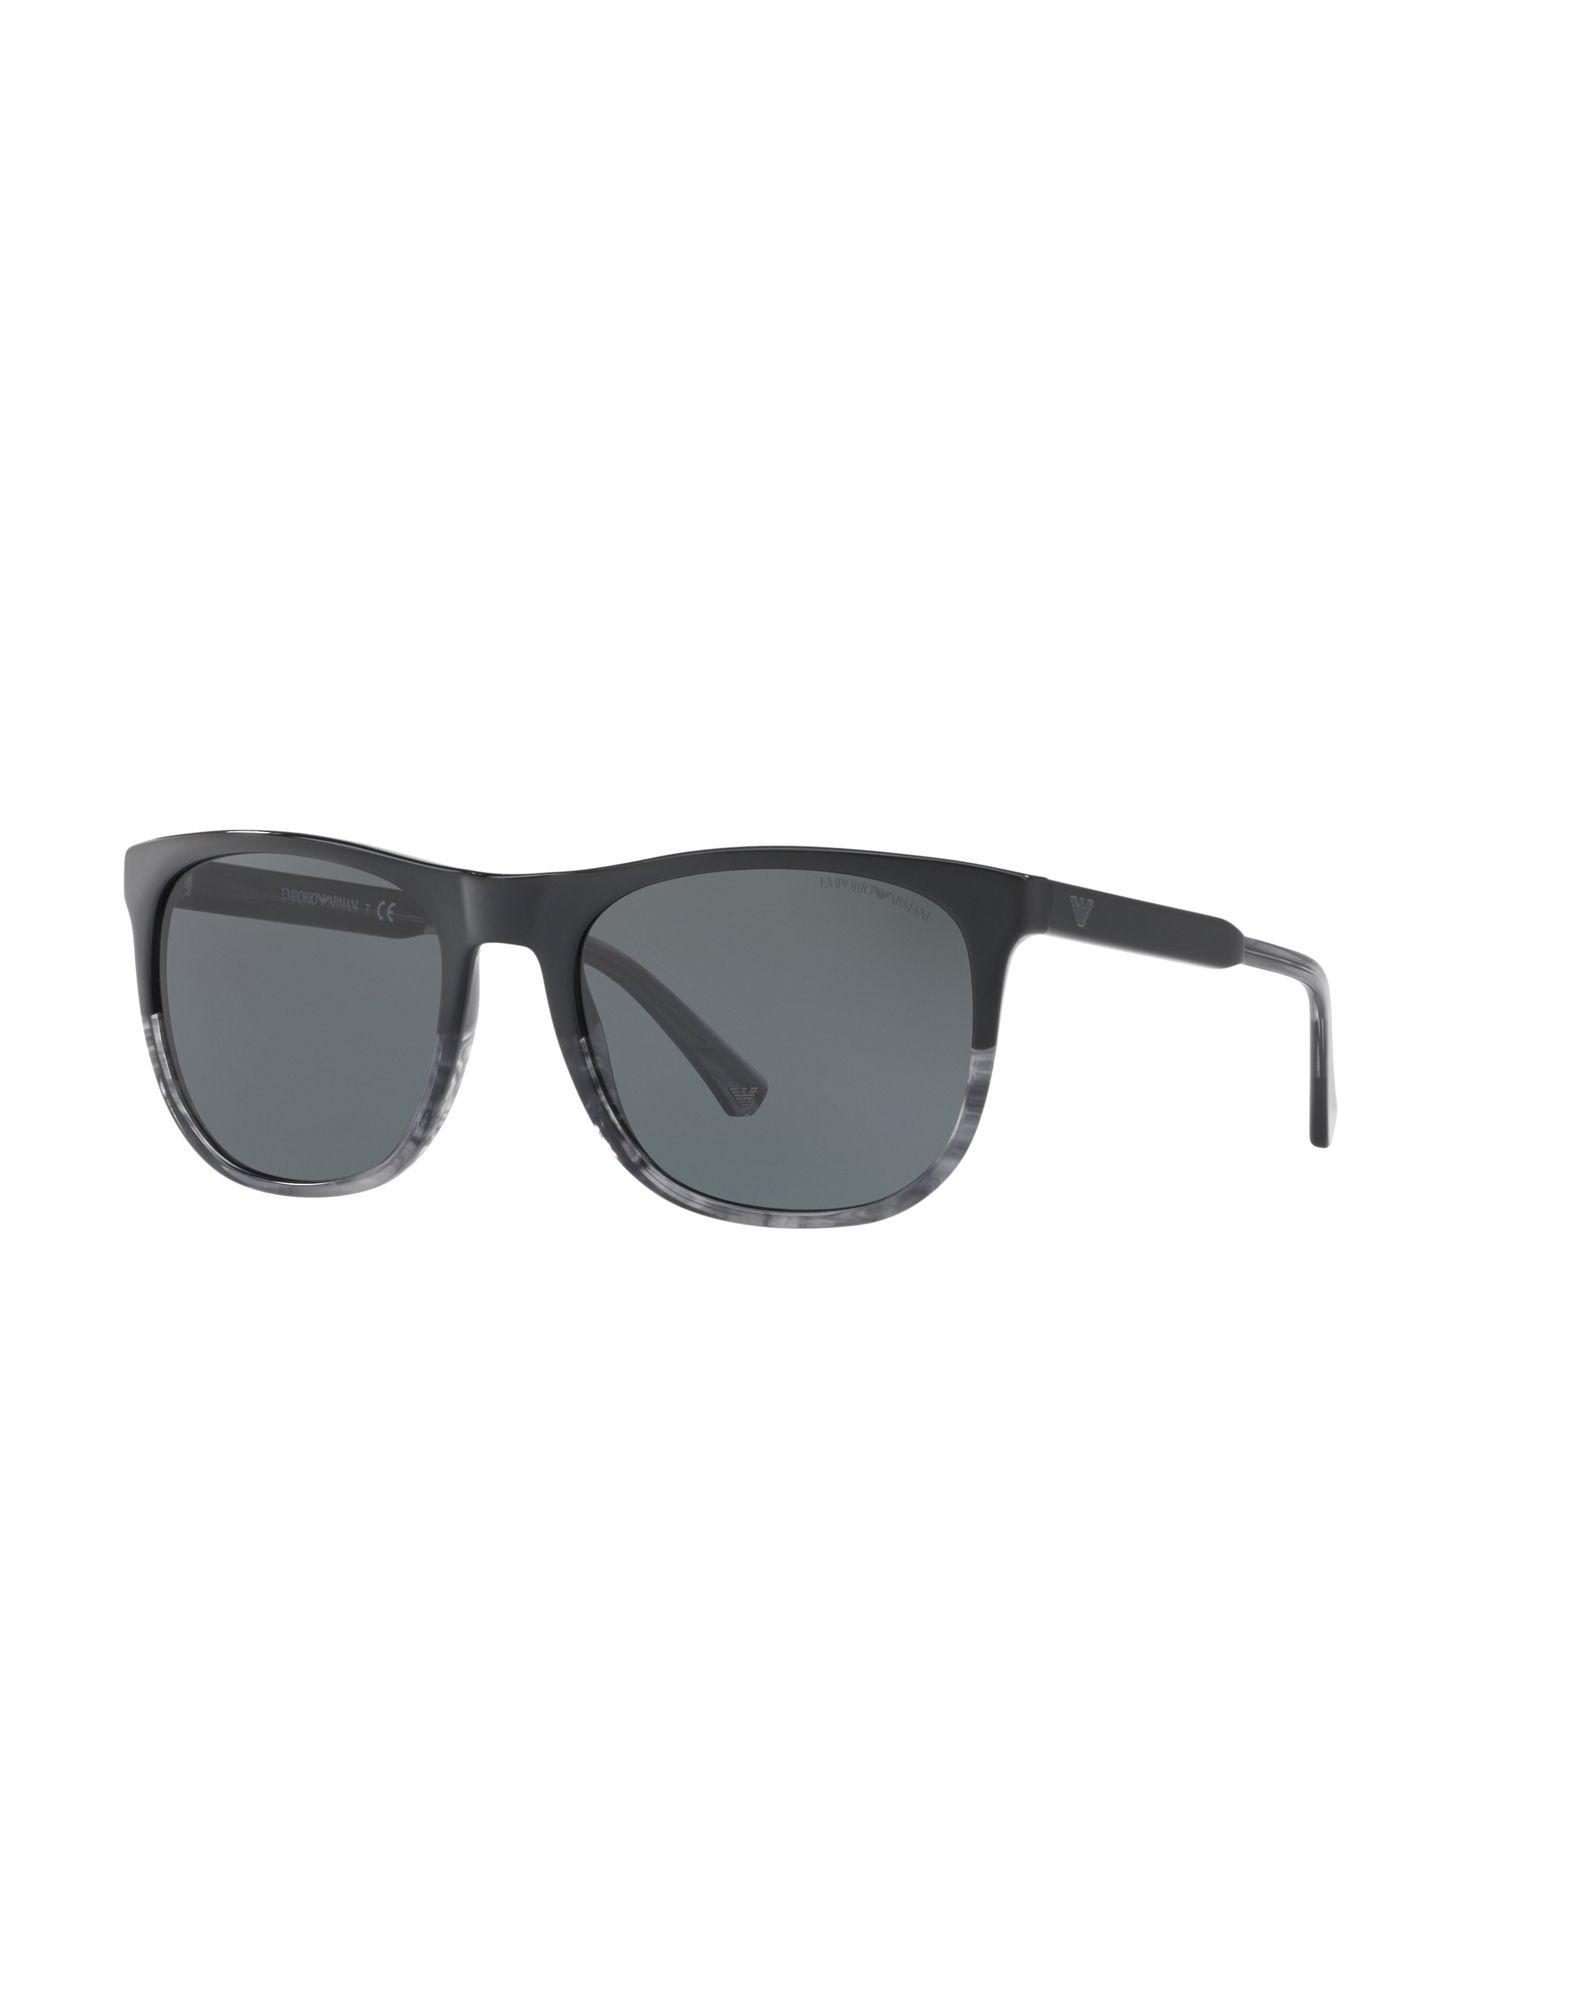 EMPORIO ARMANI Солнечные очки очки мода 2017 женские солнечные